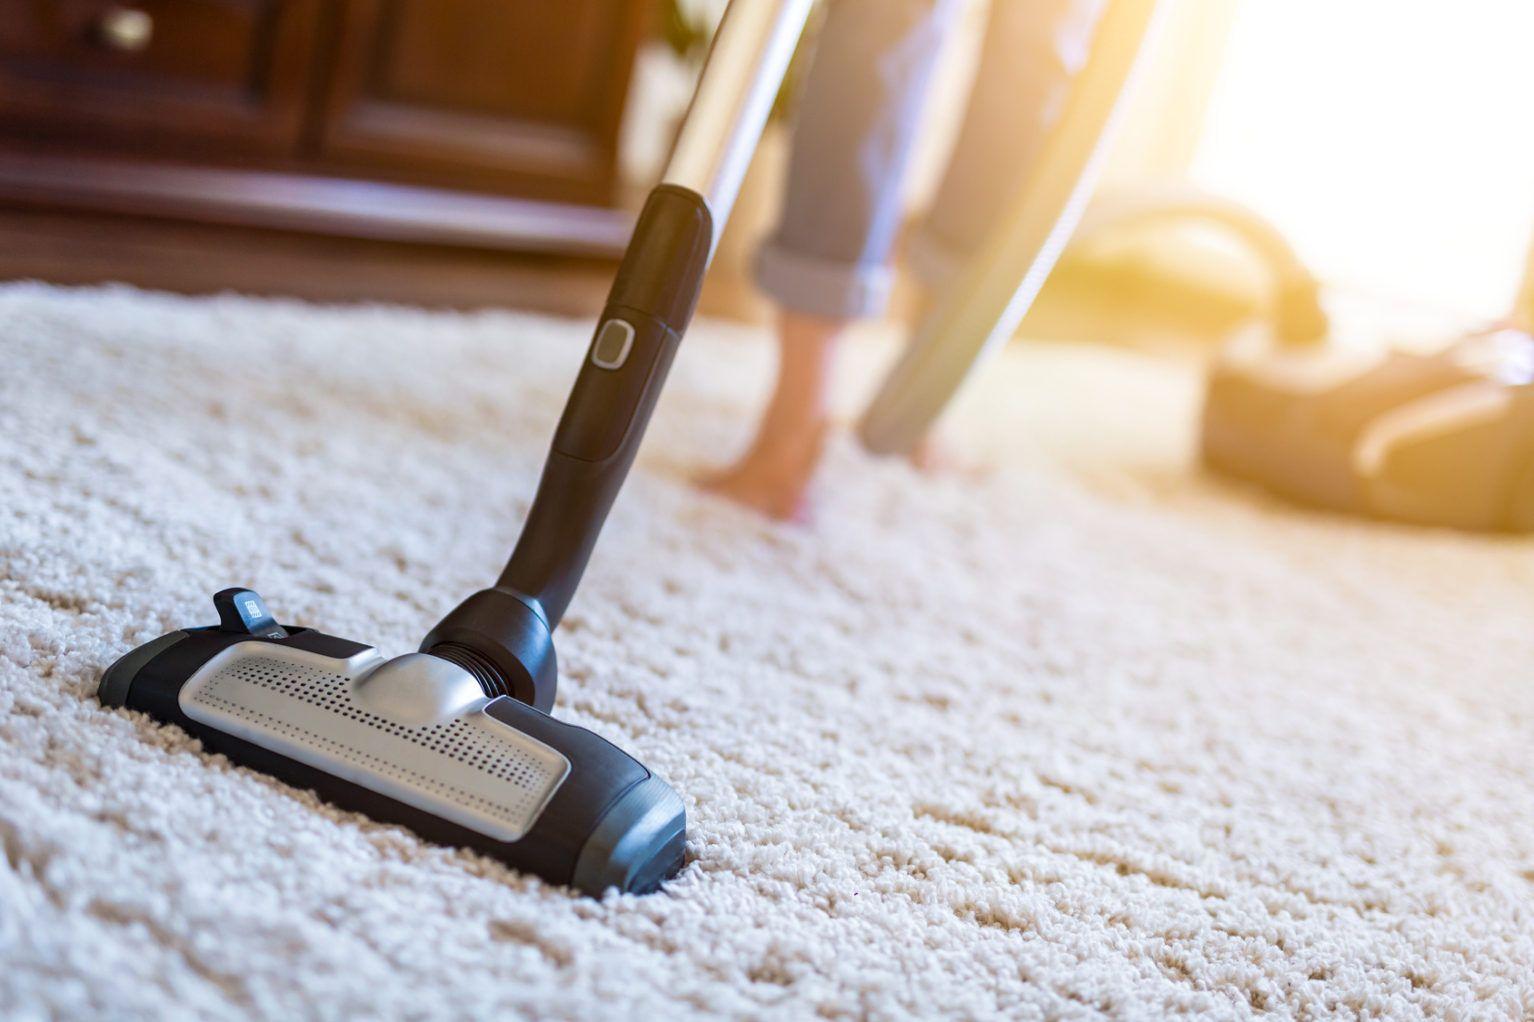 Clean carpetsHealthy Families! How to clean carpet